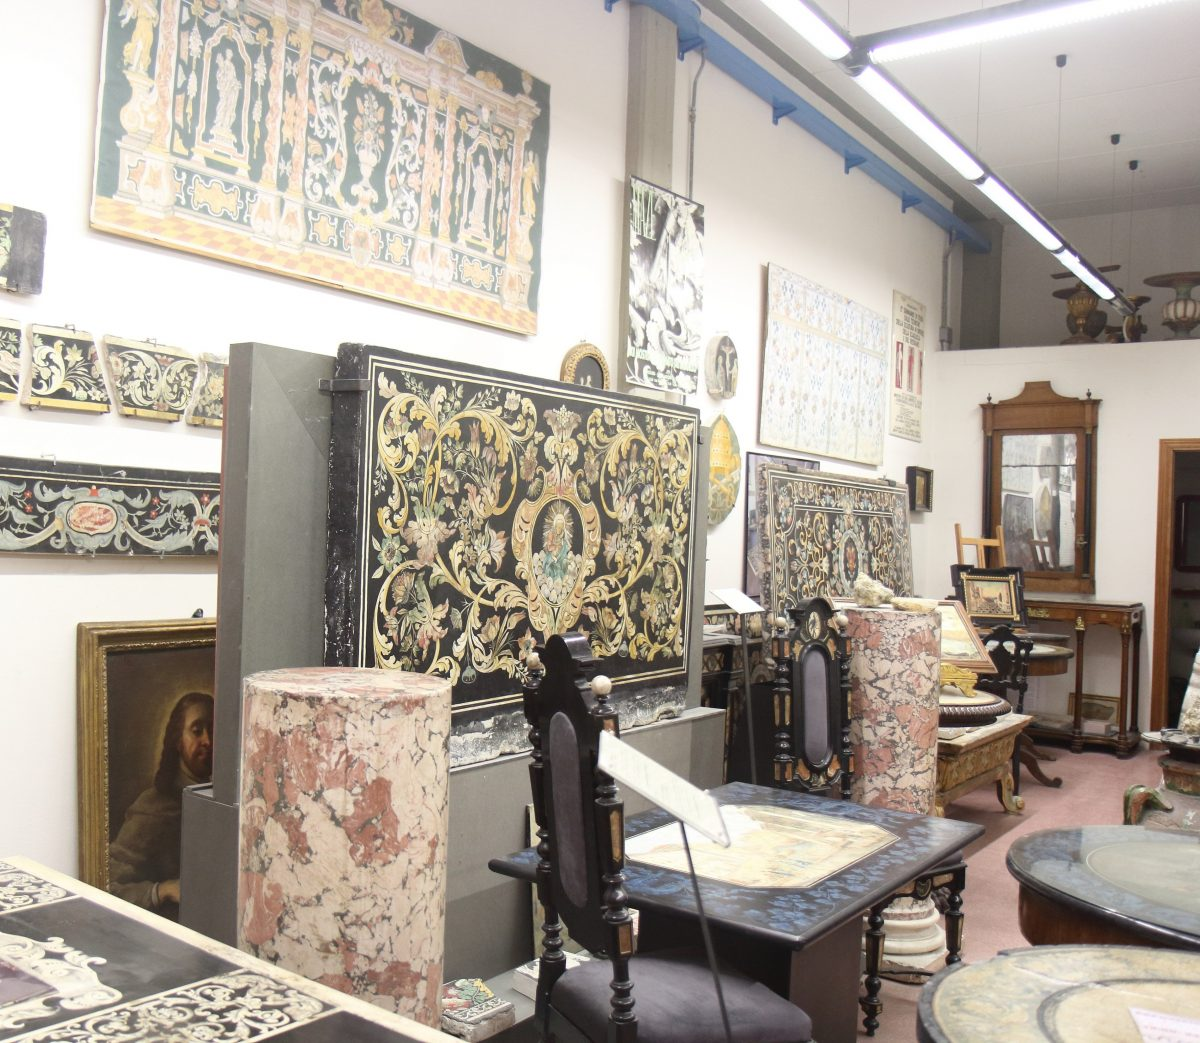 Historic scagliola pieces, Florence.